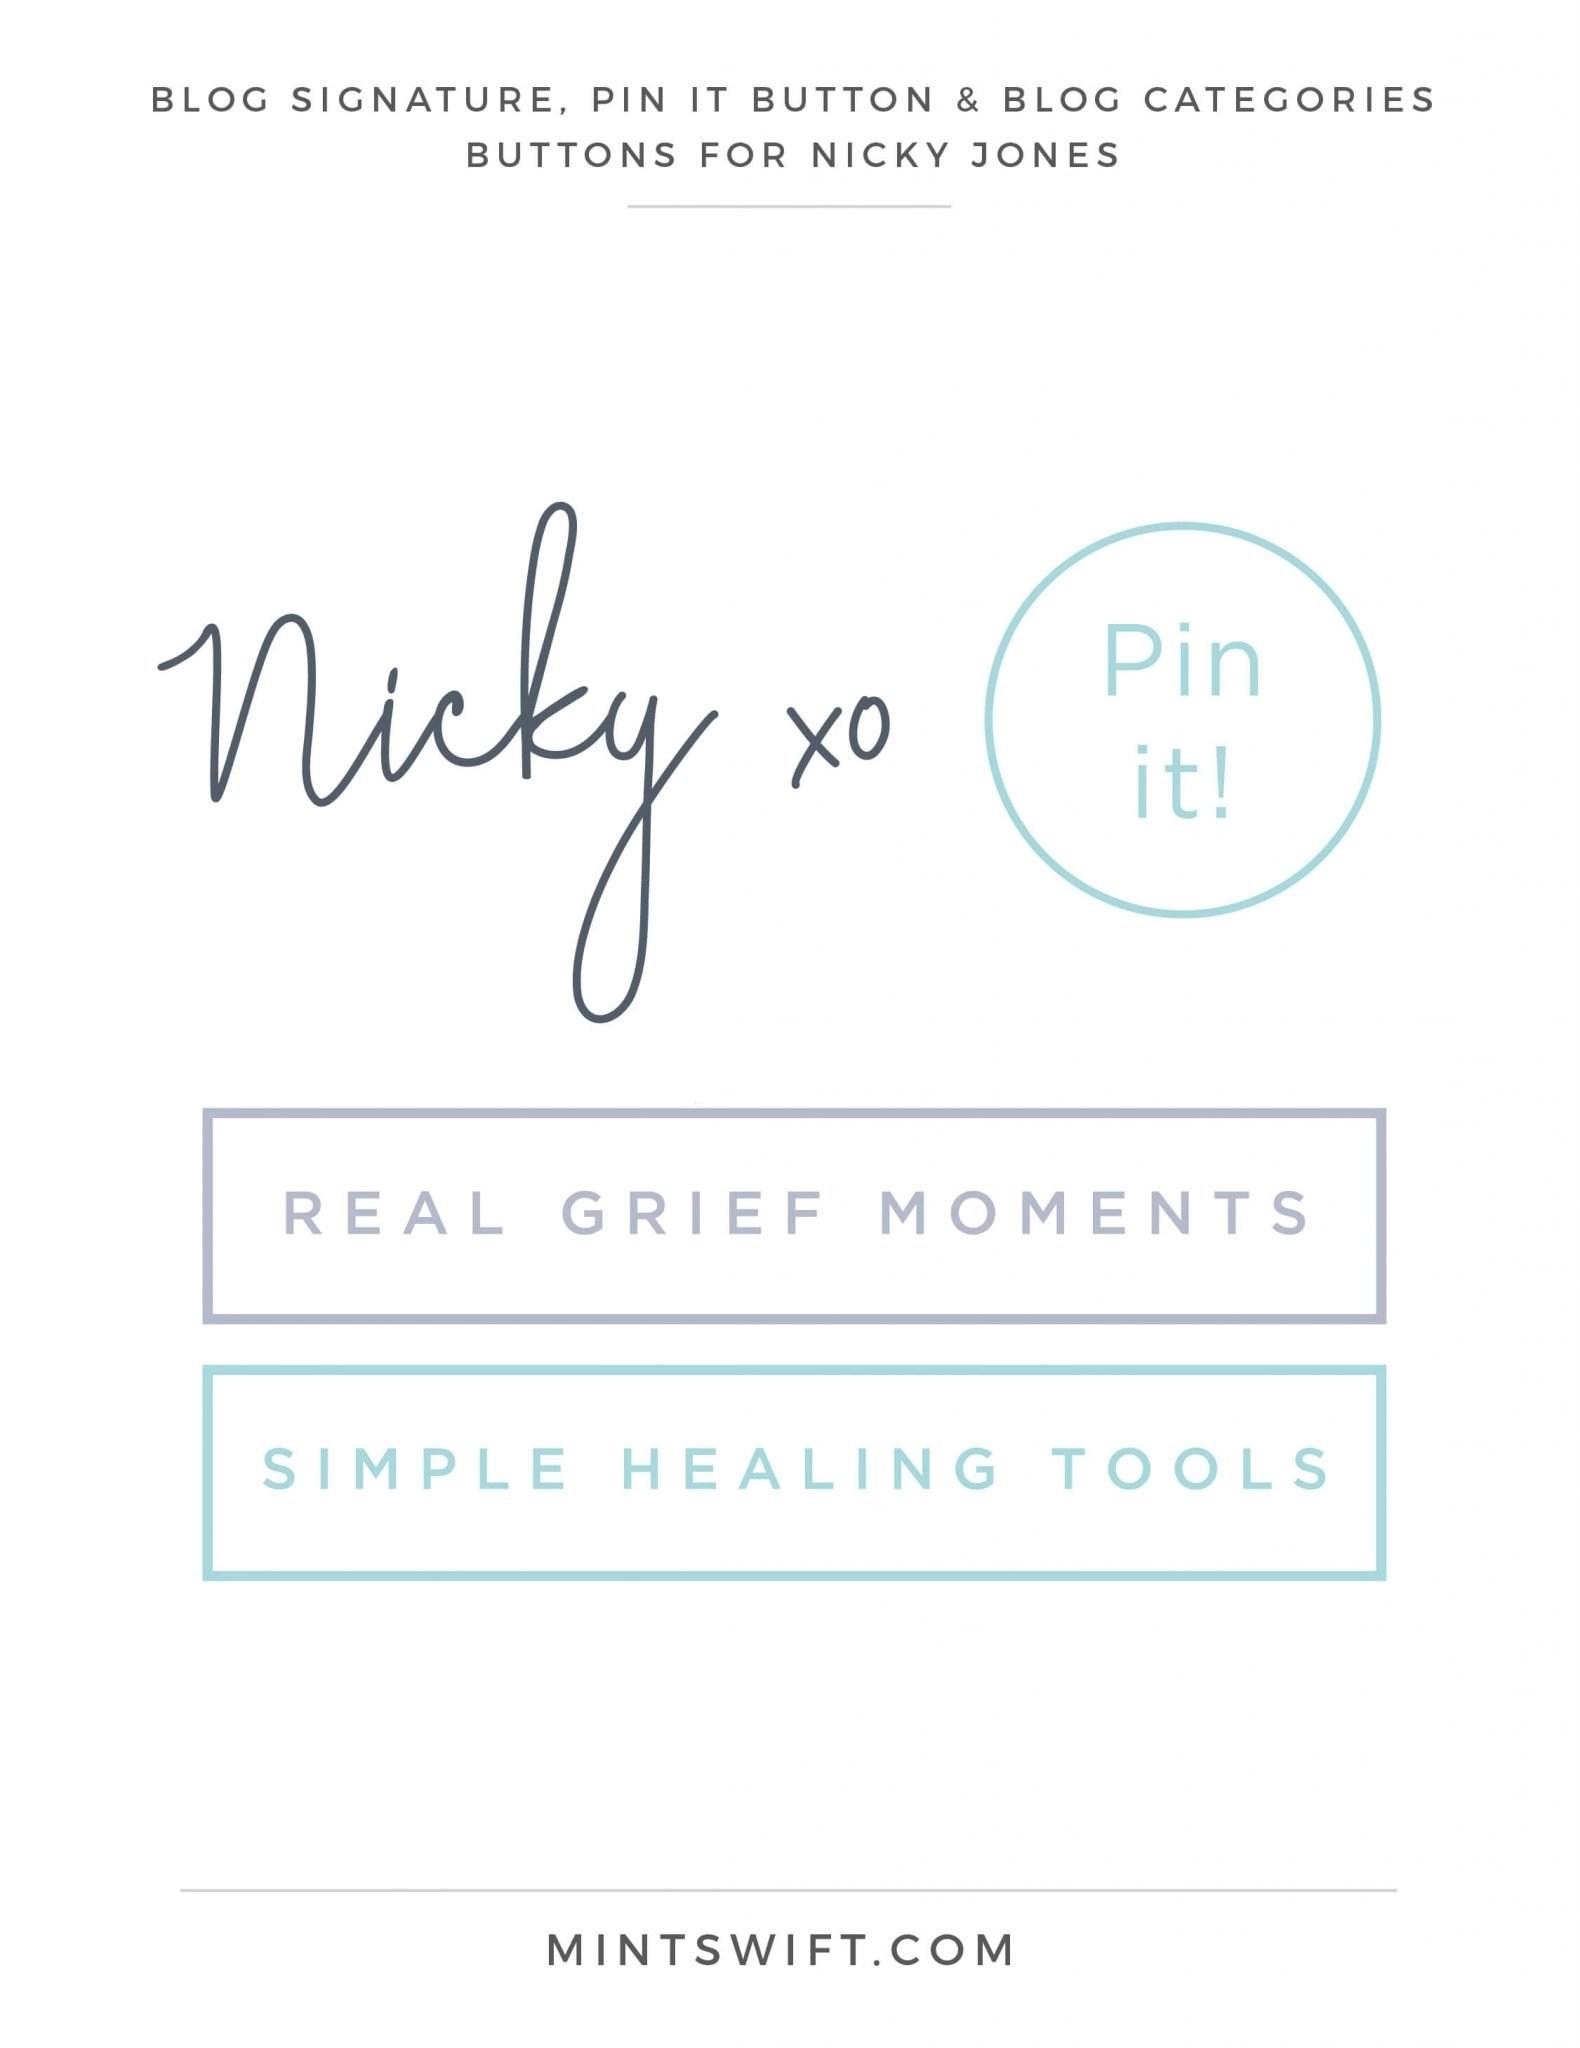 Nicky Jones - Blog Signature, Pin It Button & Blog Categories - Brand Design Package - MintSwift